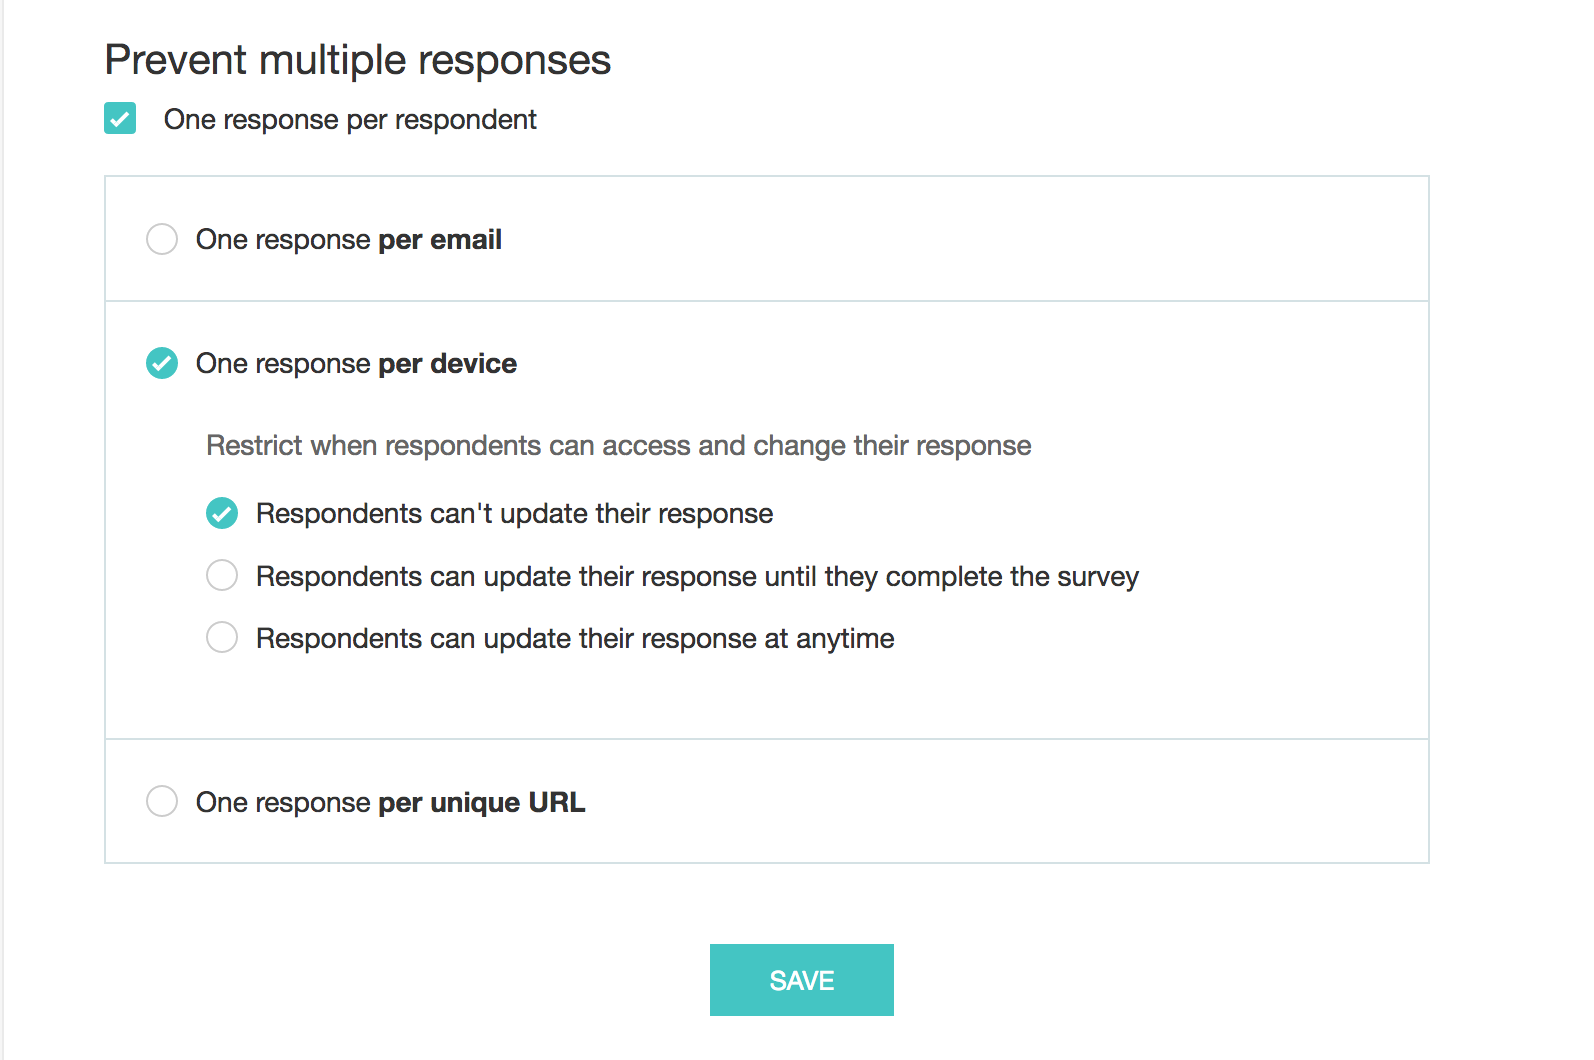 Prevent multiple responses for your survey